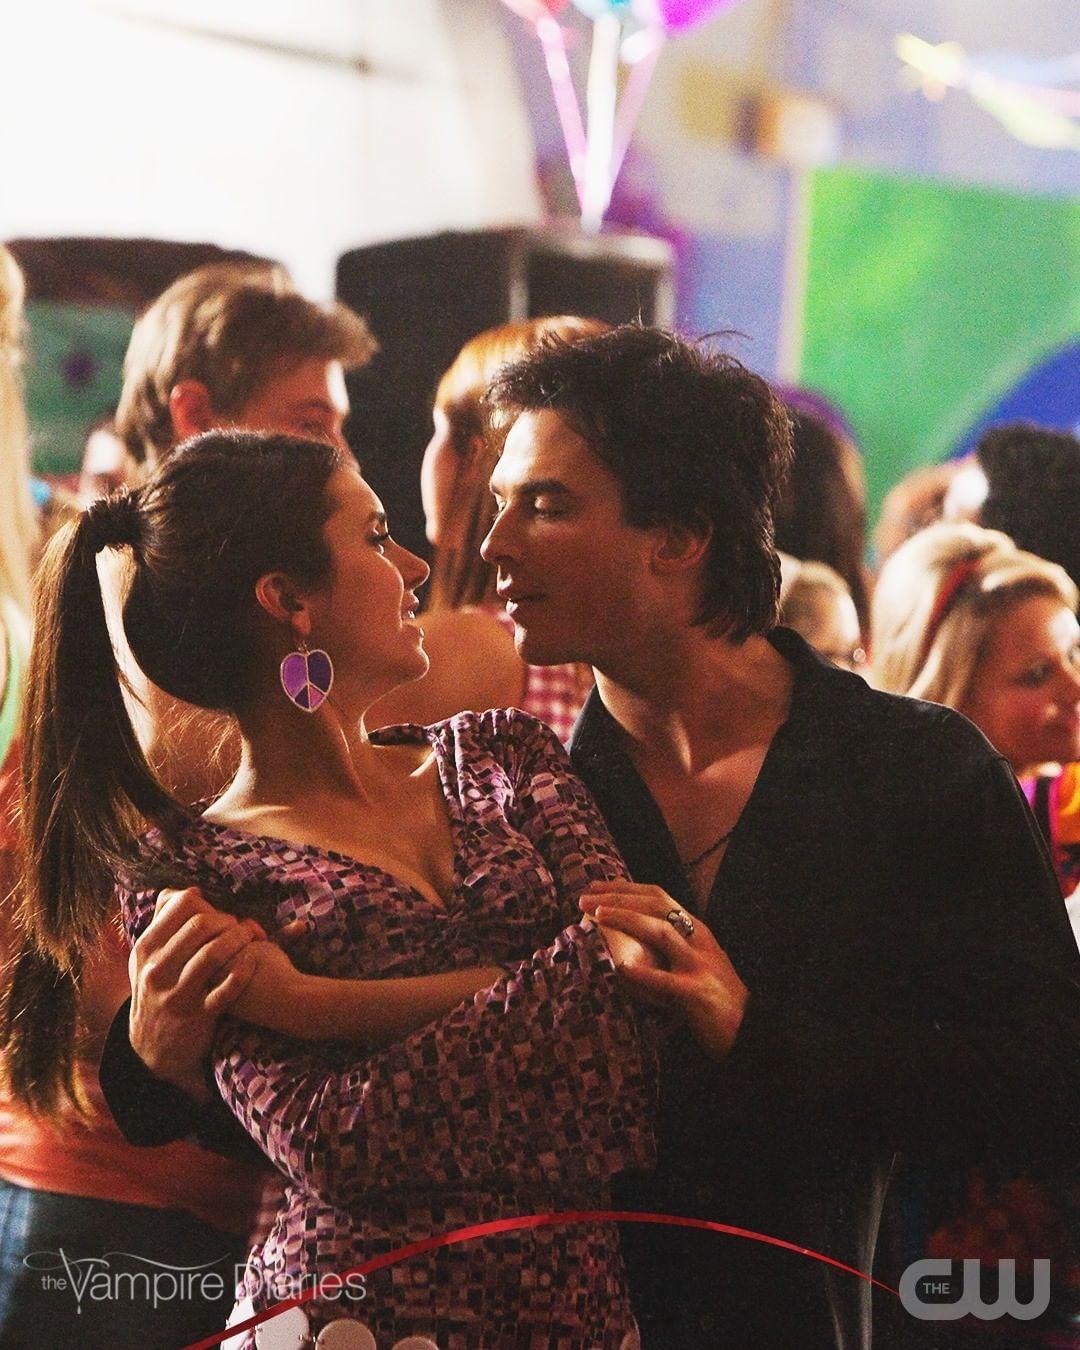 A photo showing Nina Dobrev and Ian Somerhalder dancing